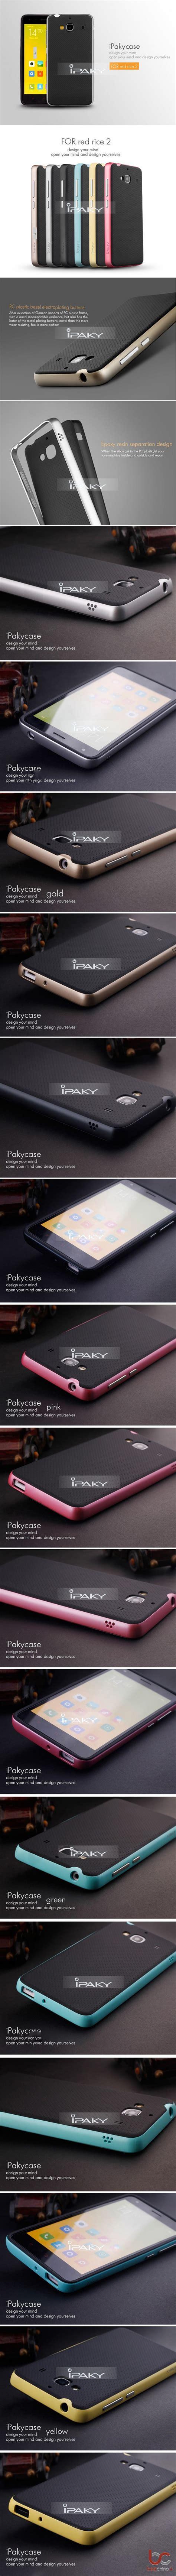 Ipaky Xiaomi Redmi 2 綷 寘 寘 崧 綷 xiaomi redmi 2 綷 綷 綷 2